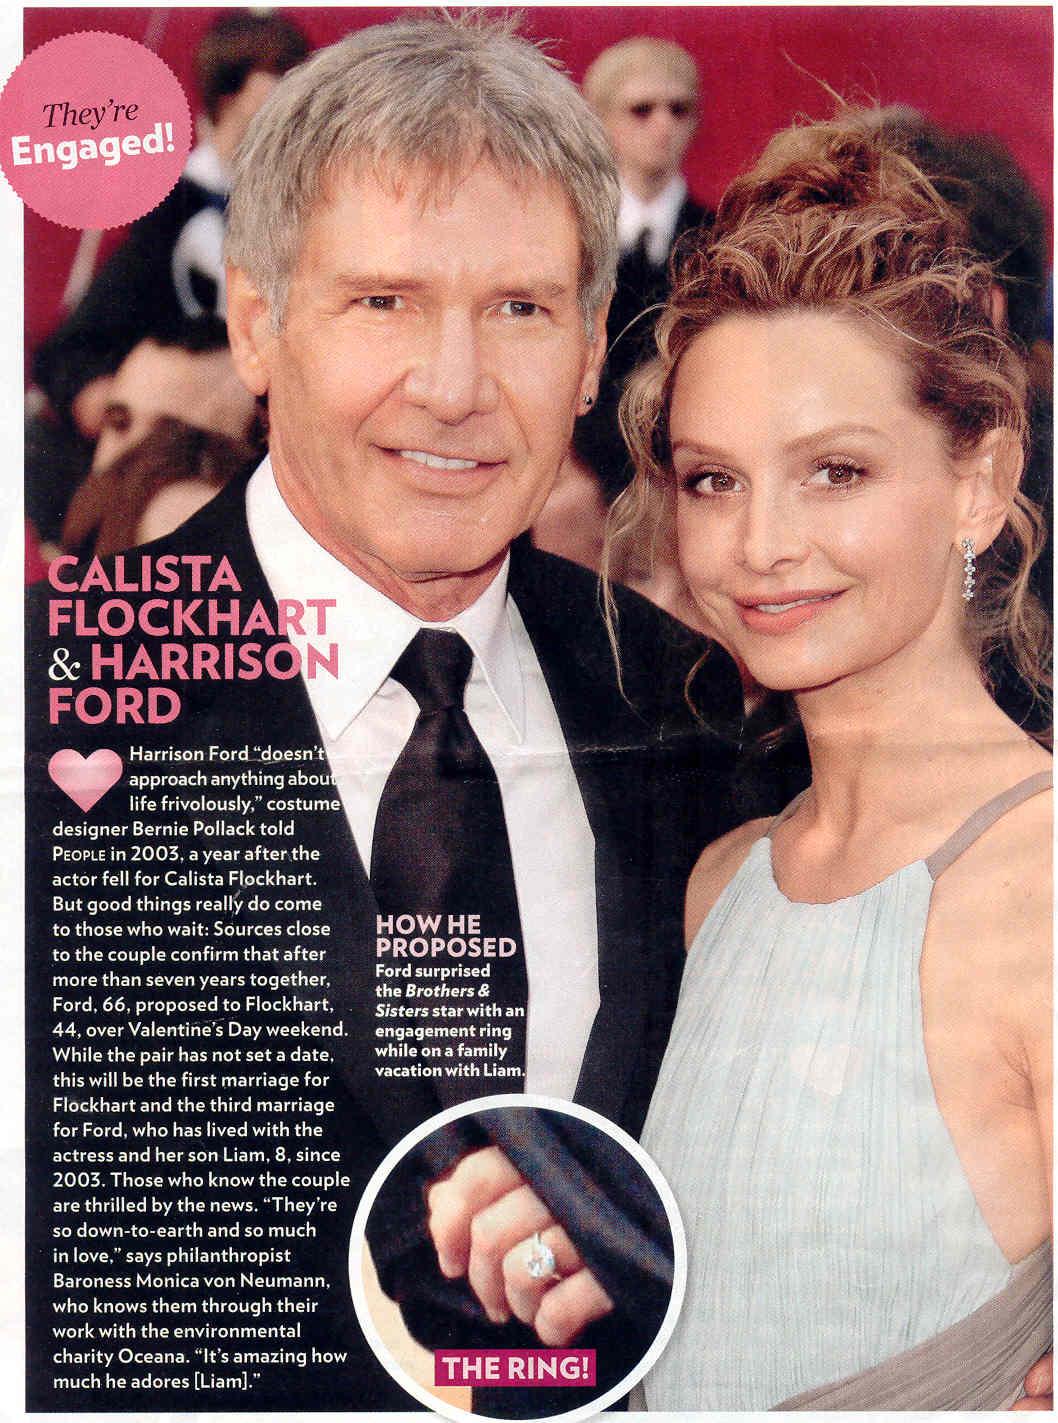 Calista Flockhart's Engagement Ring